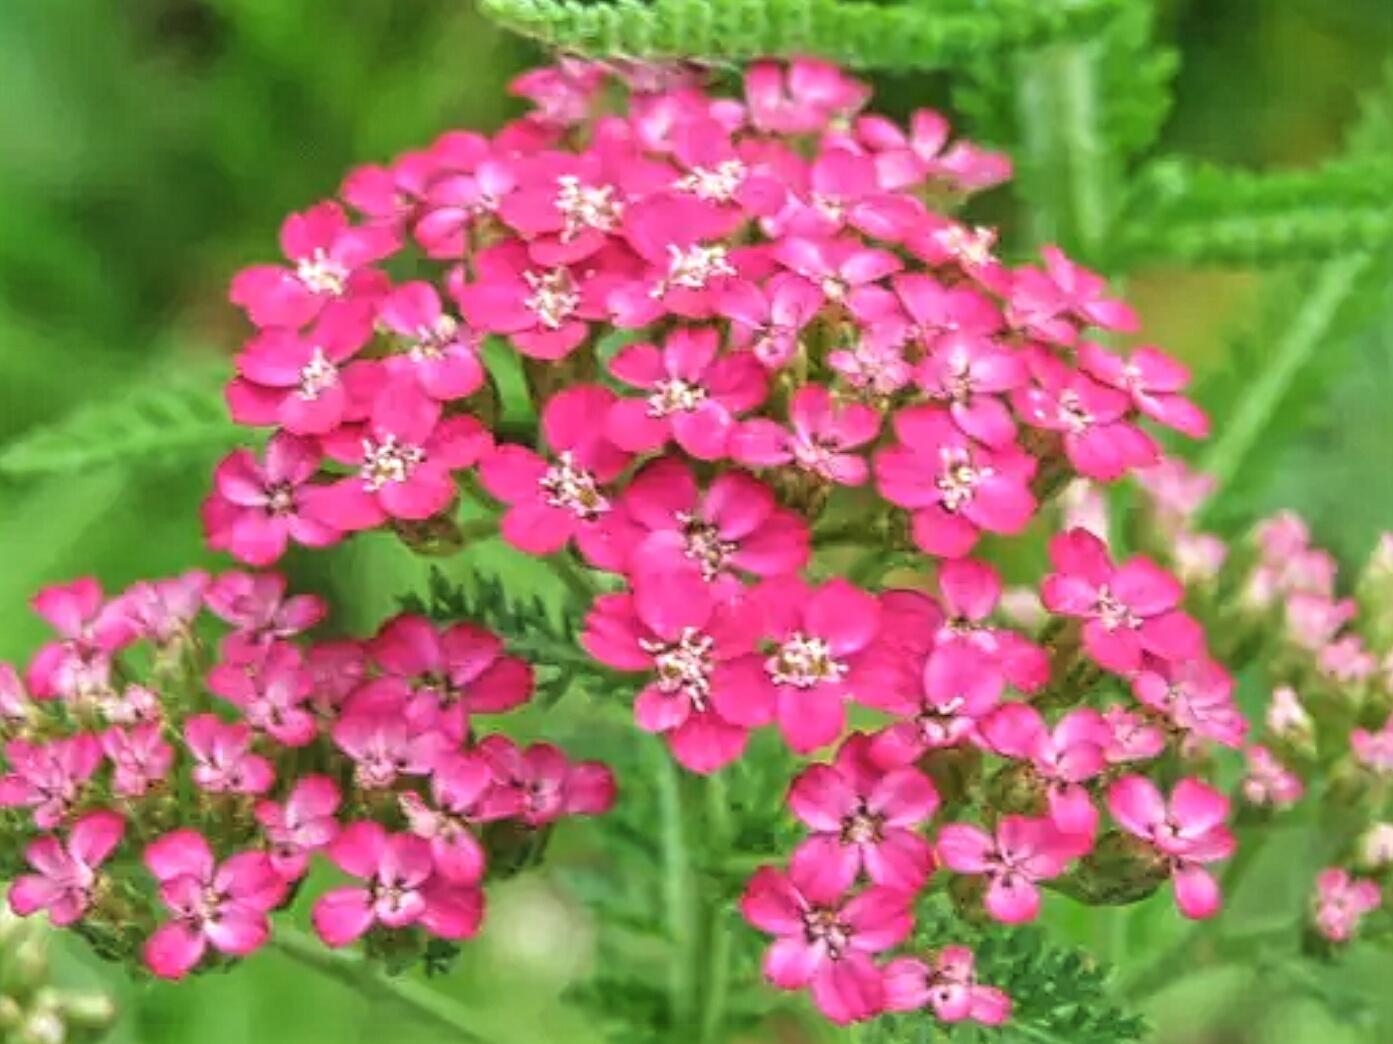 #Lovely-Wanko-blog: 11月17日の誕生花